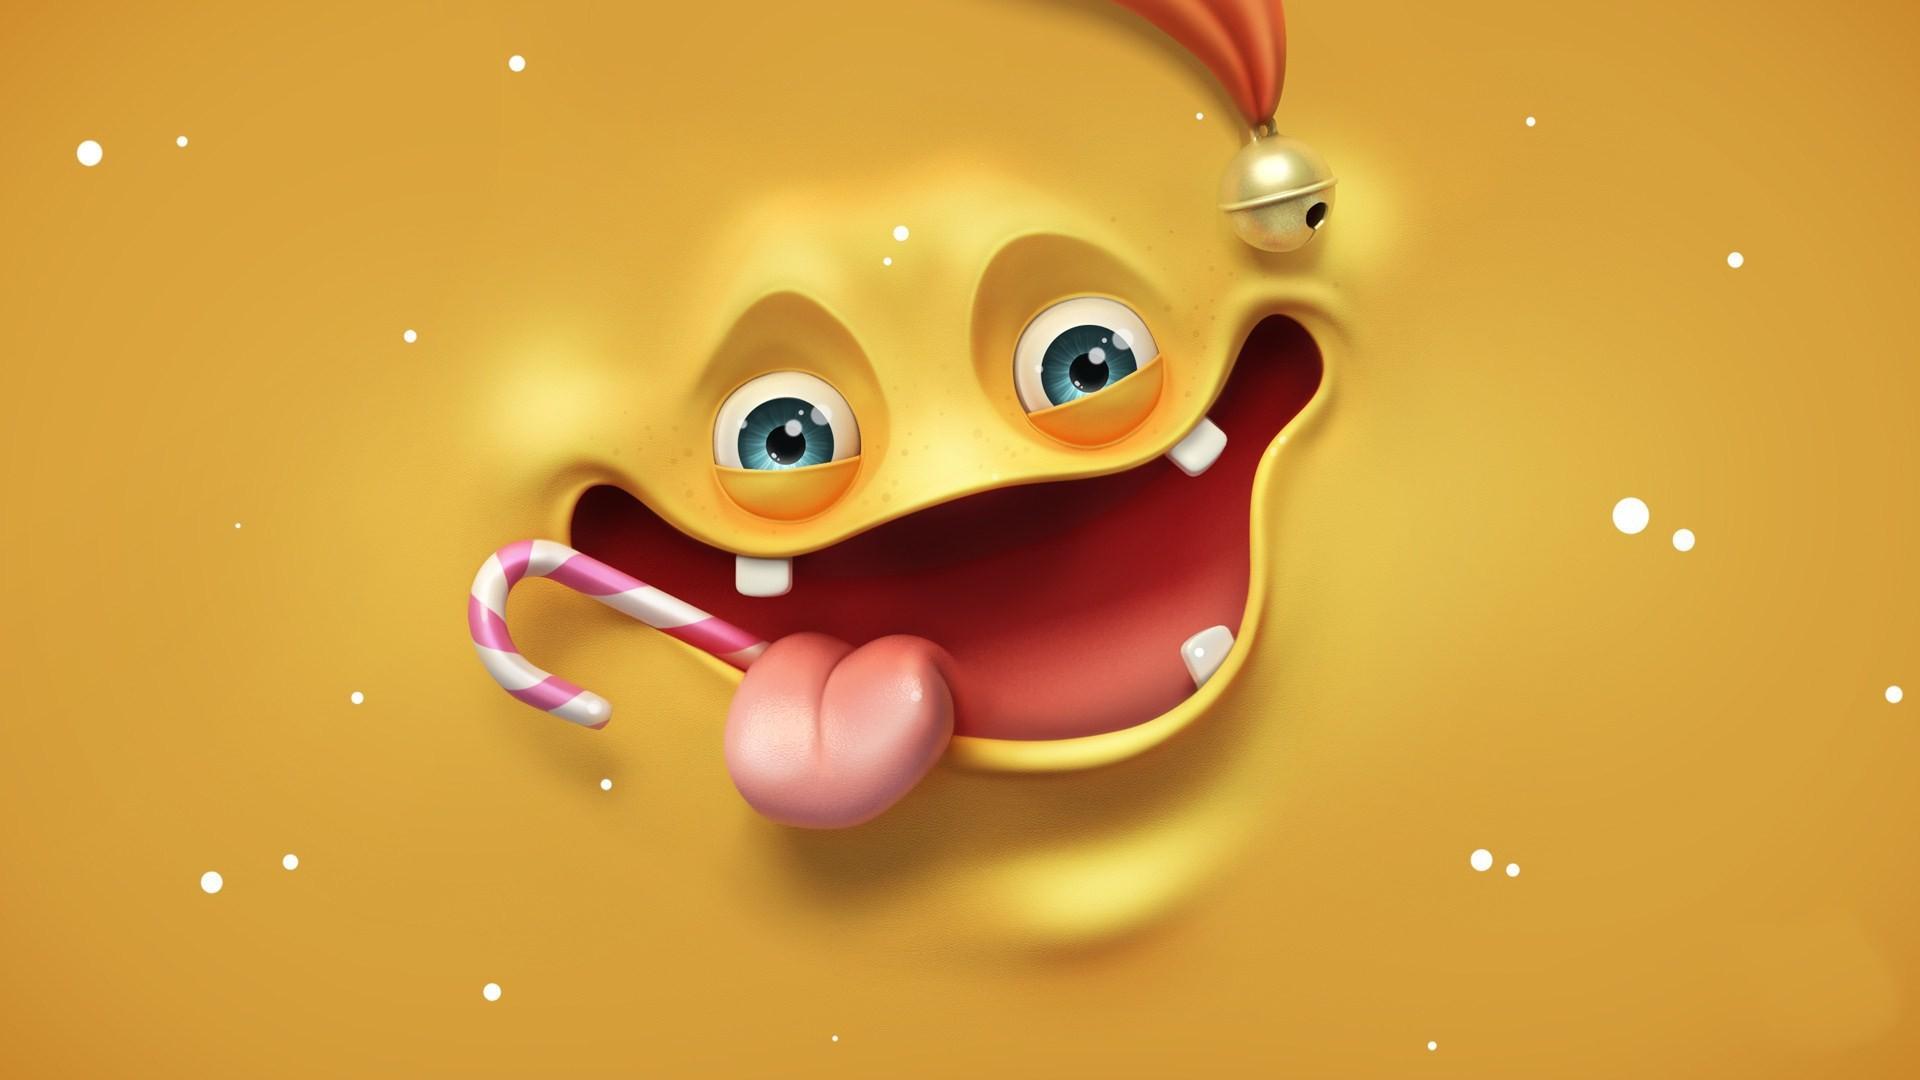 Funny Free Desktop Wallpaper | Download Free Desktop Wallpaper Images .